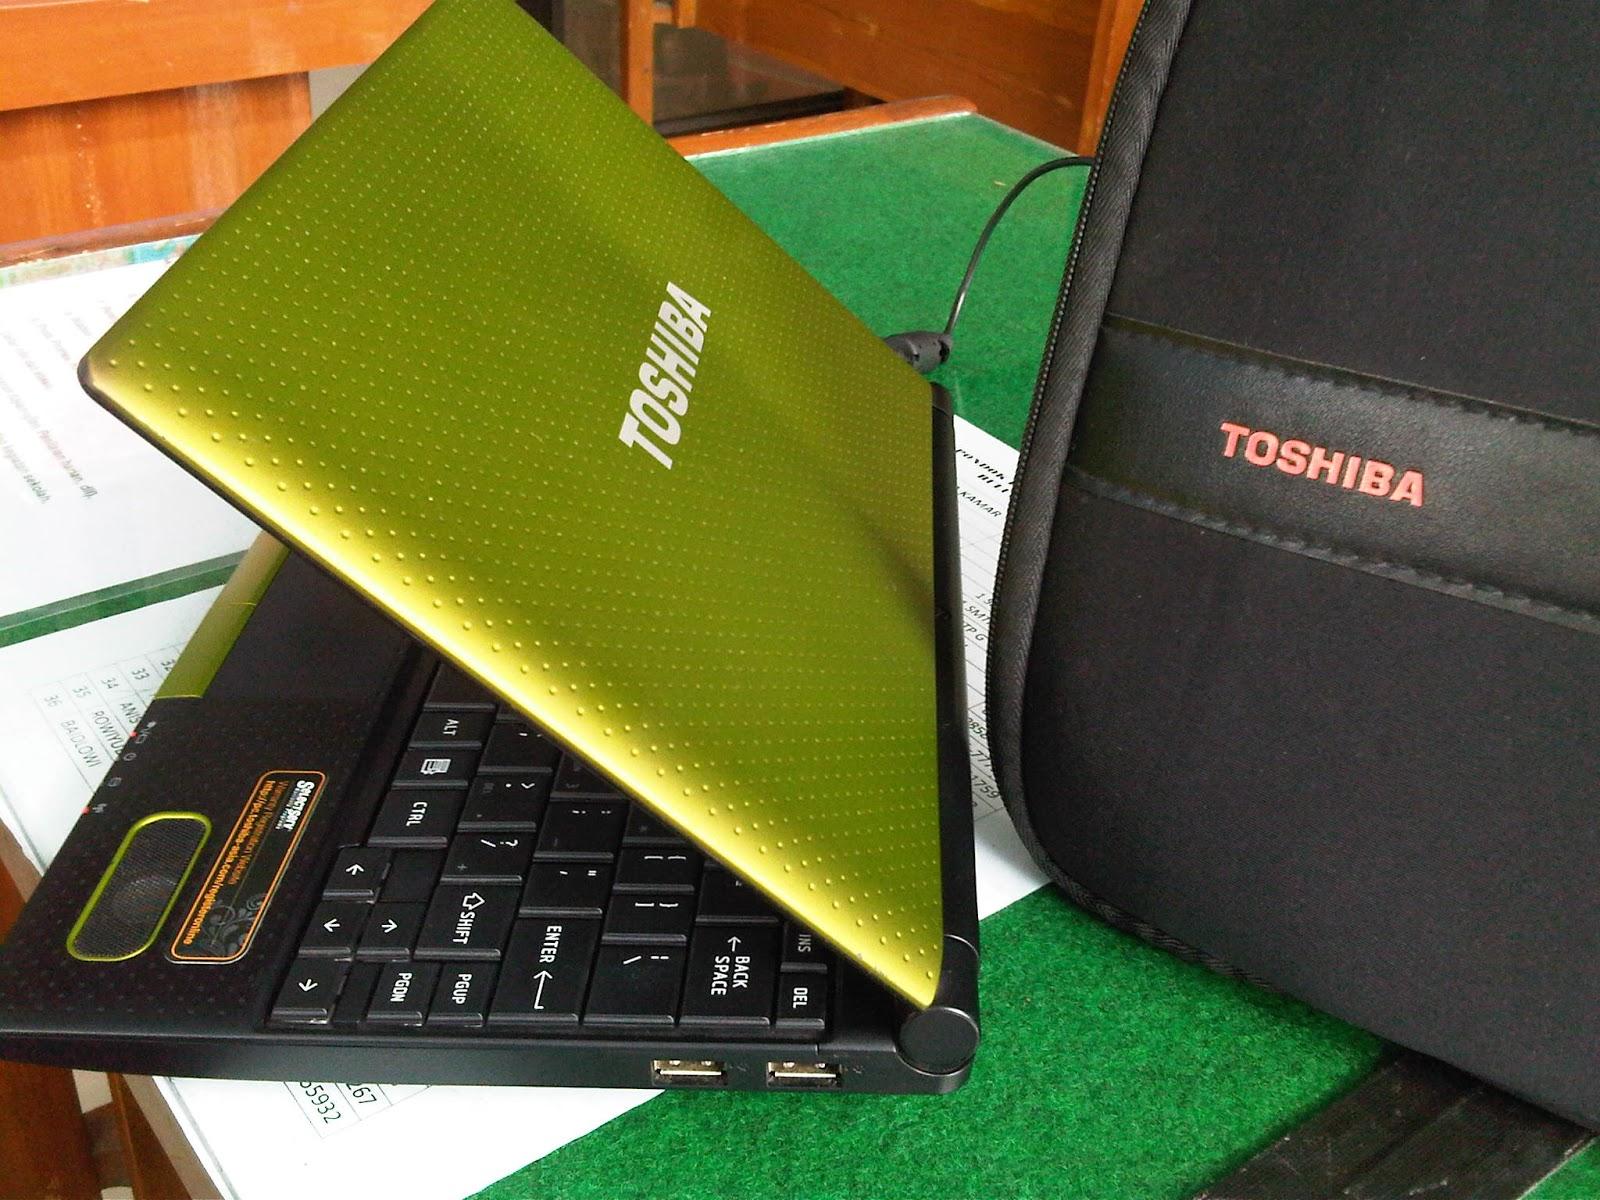 LaptopSecondBekasMalangNetbookToshibaN520Mantap